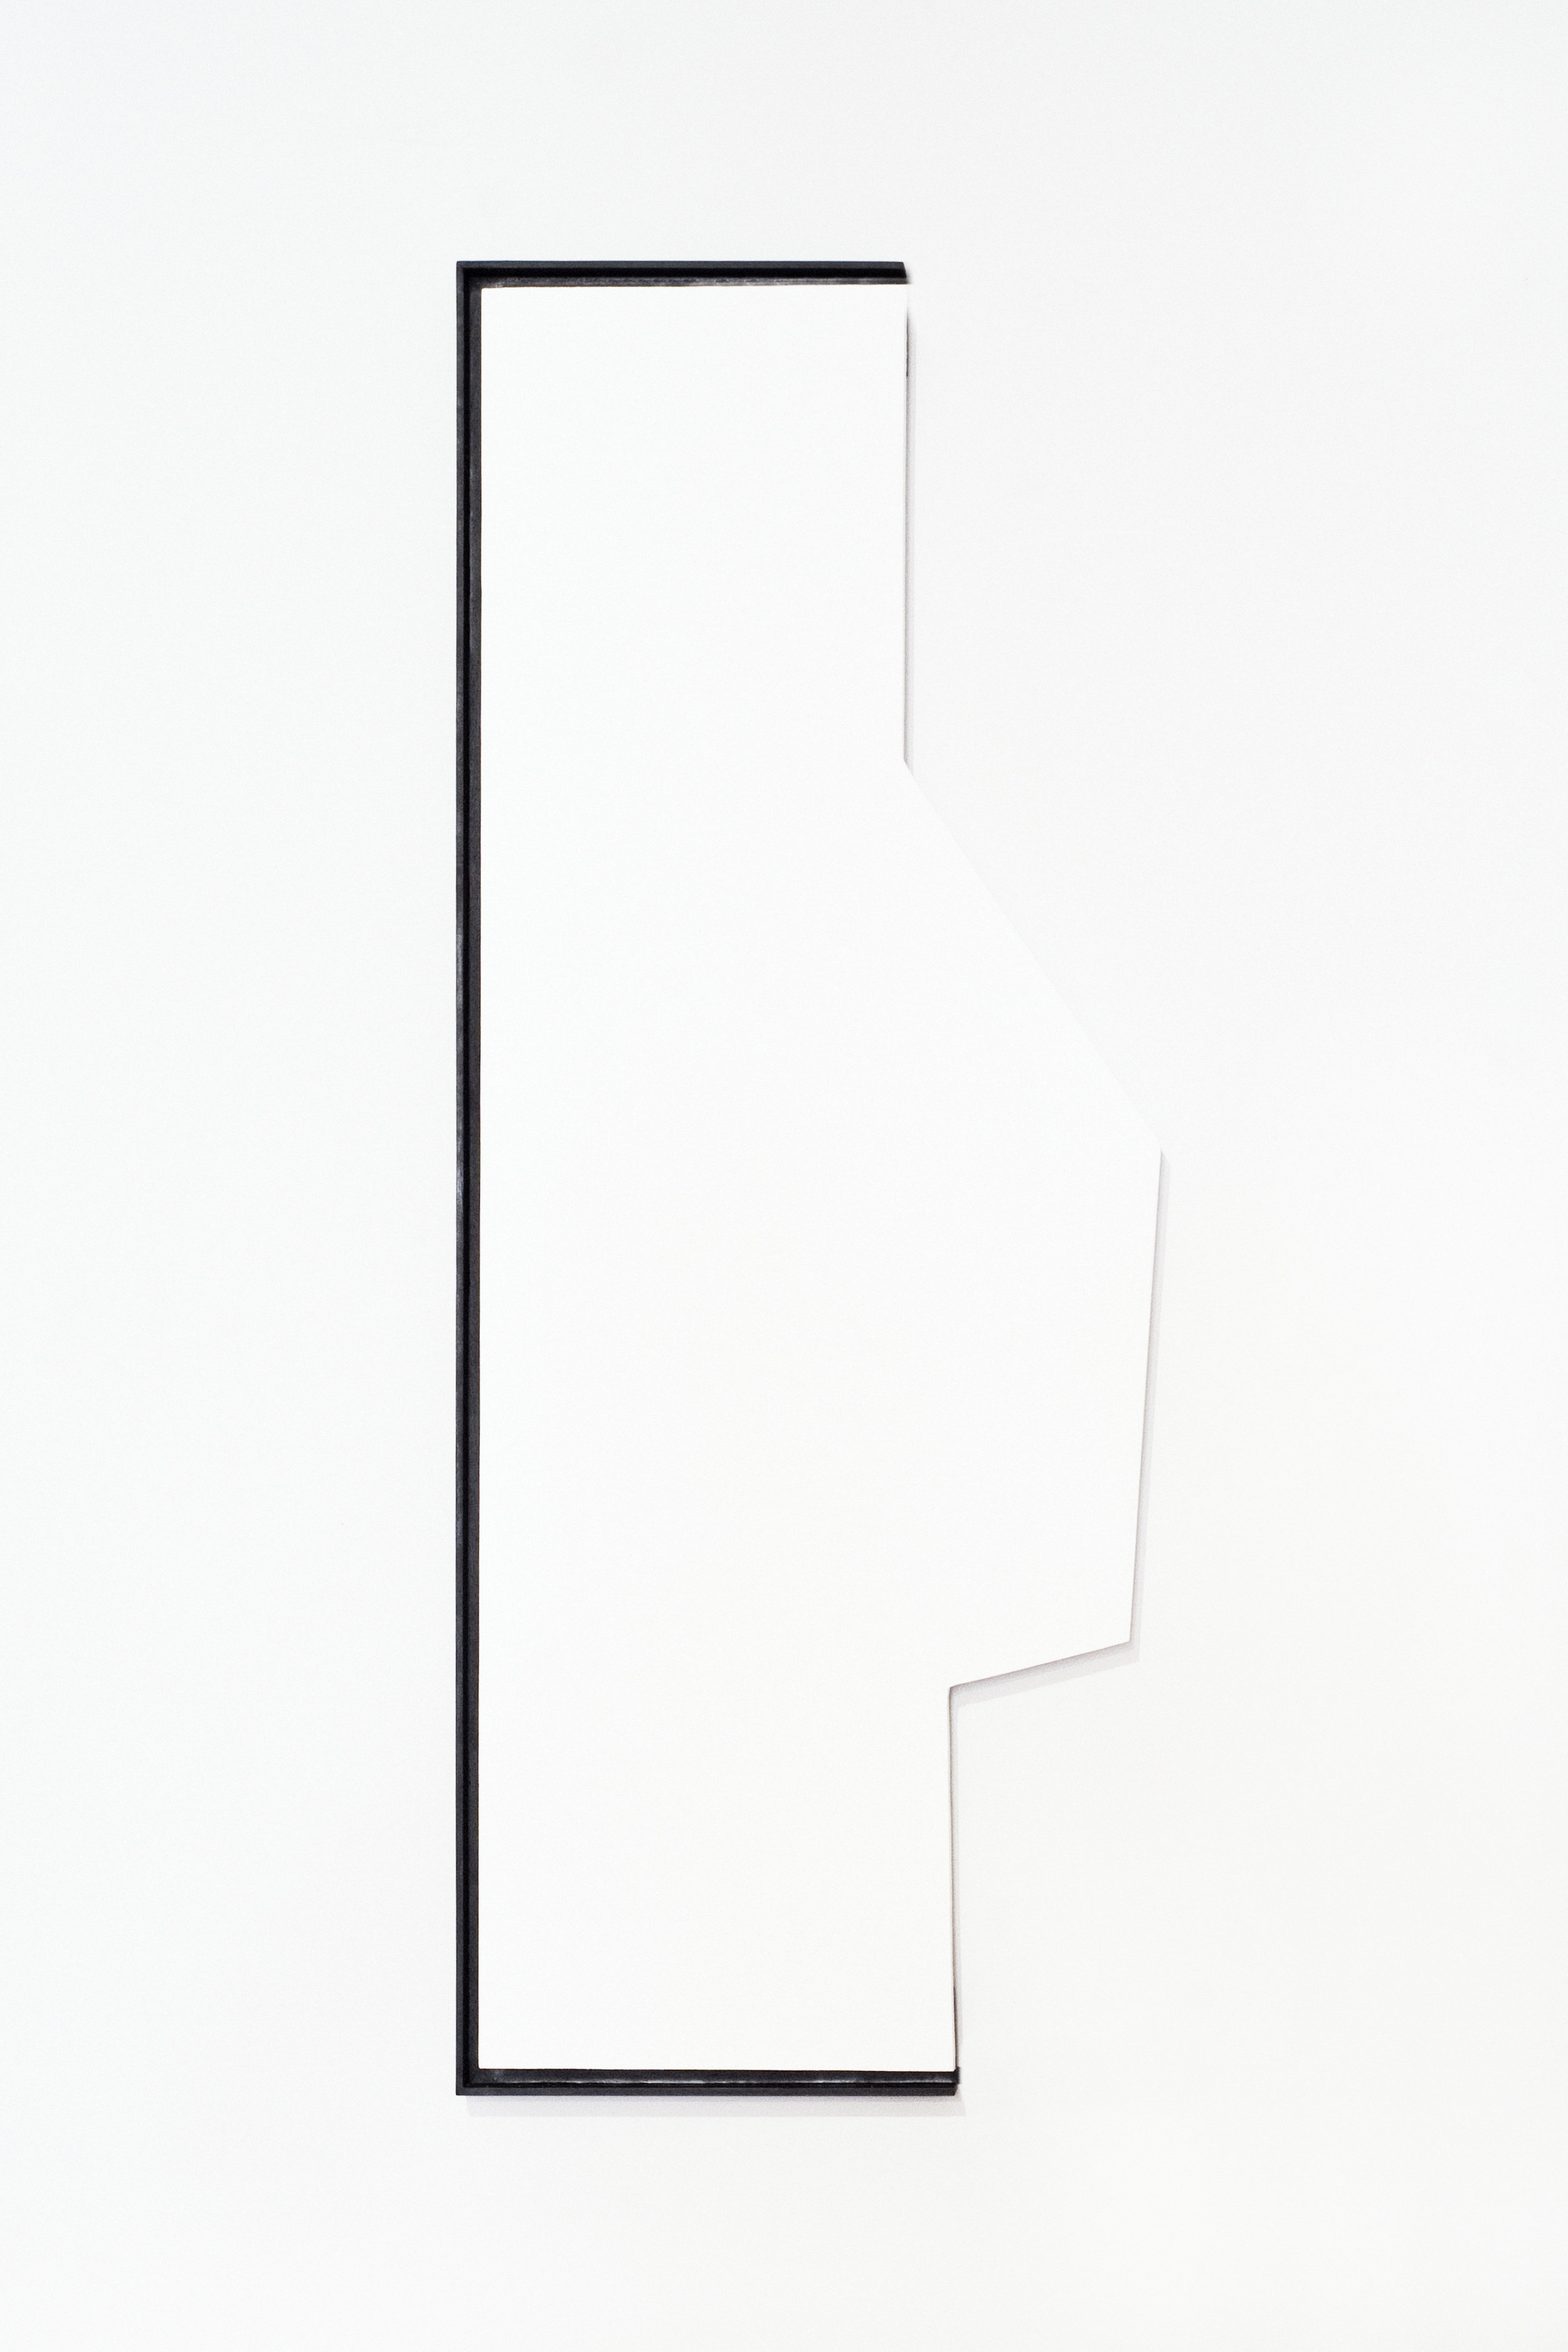 Untitled (19 E 66th St – back), 2013